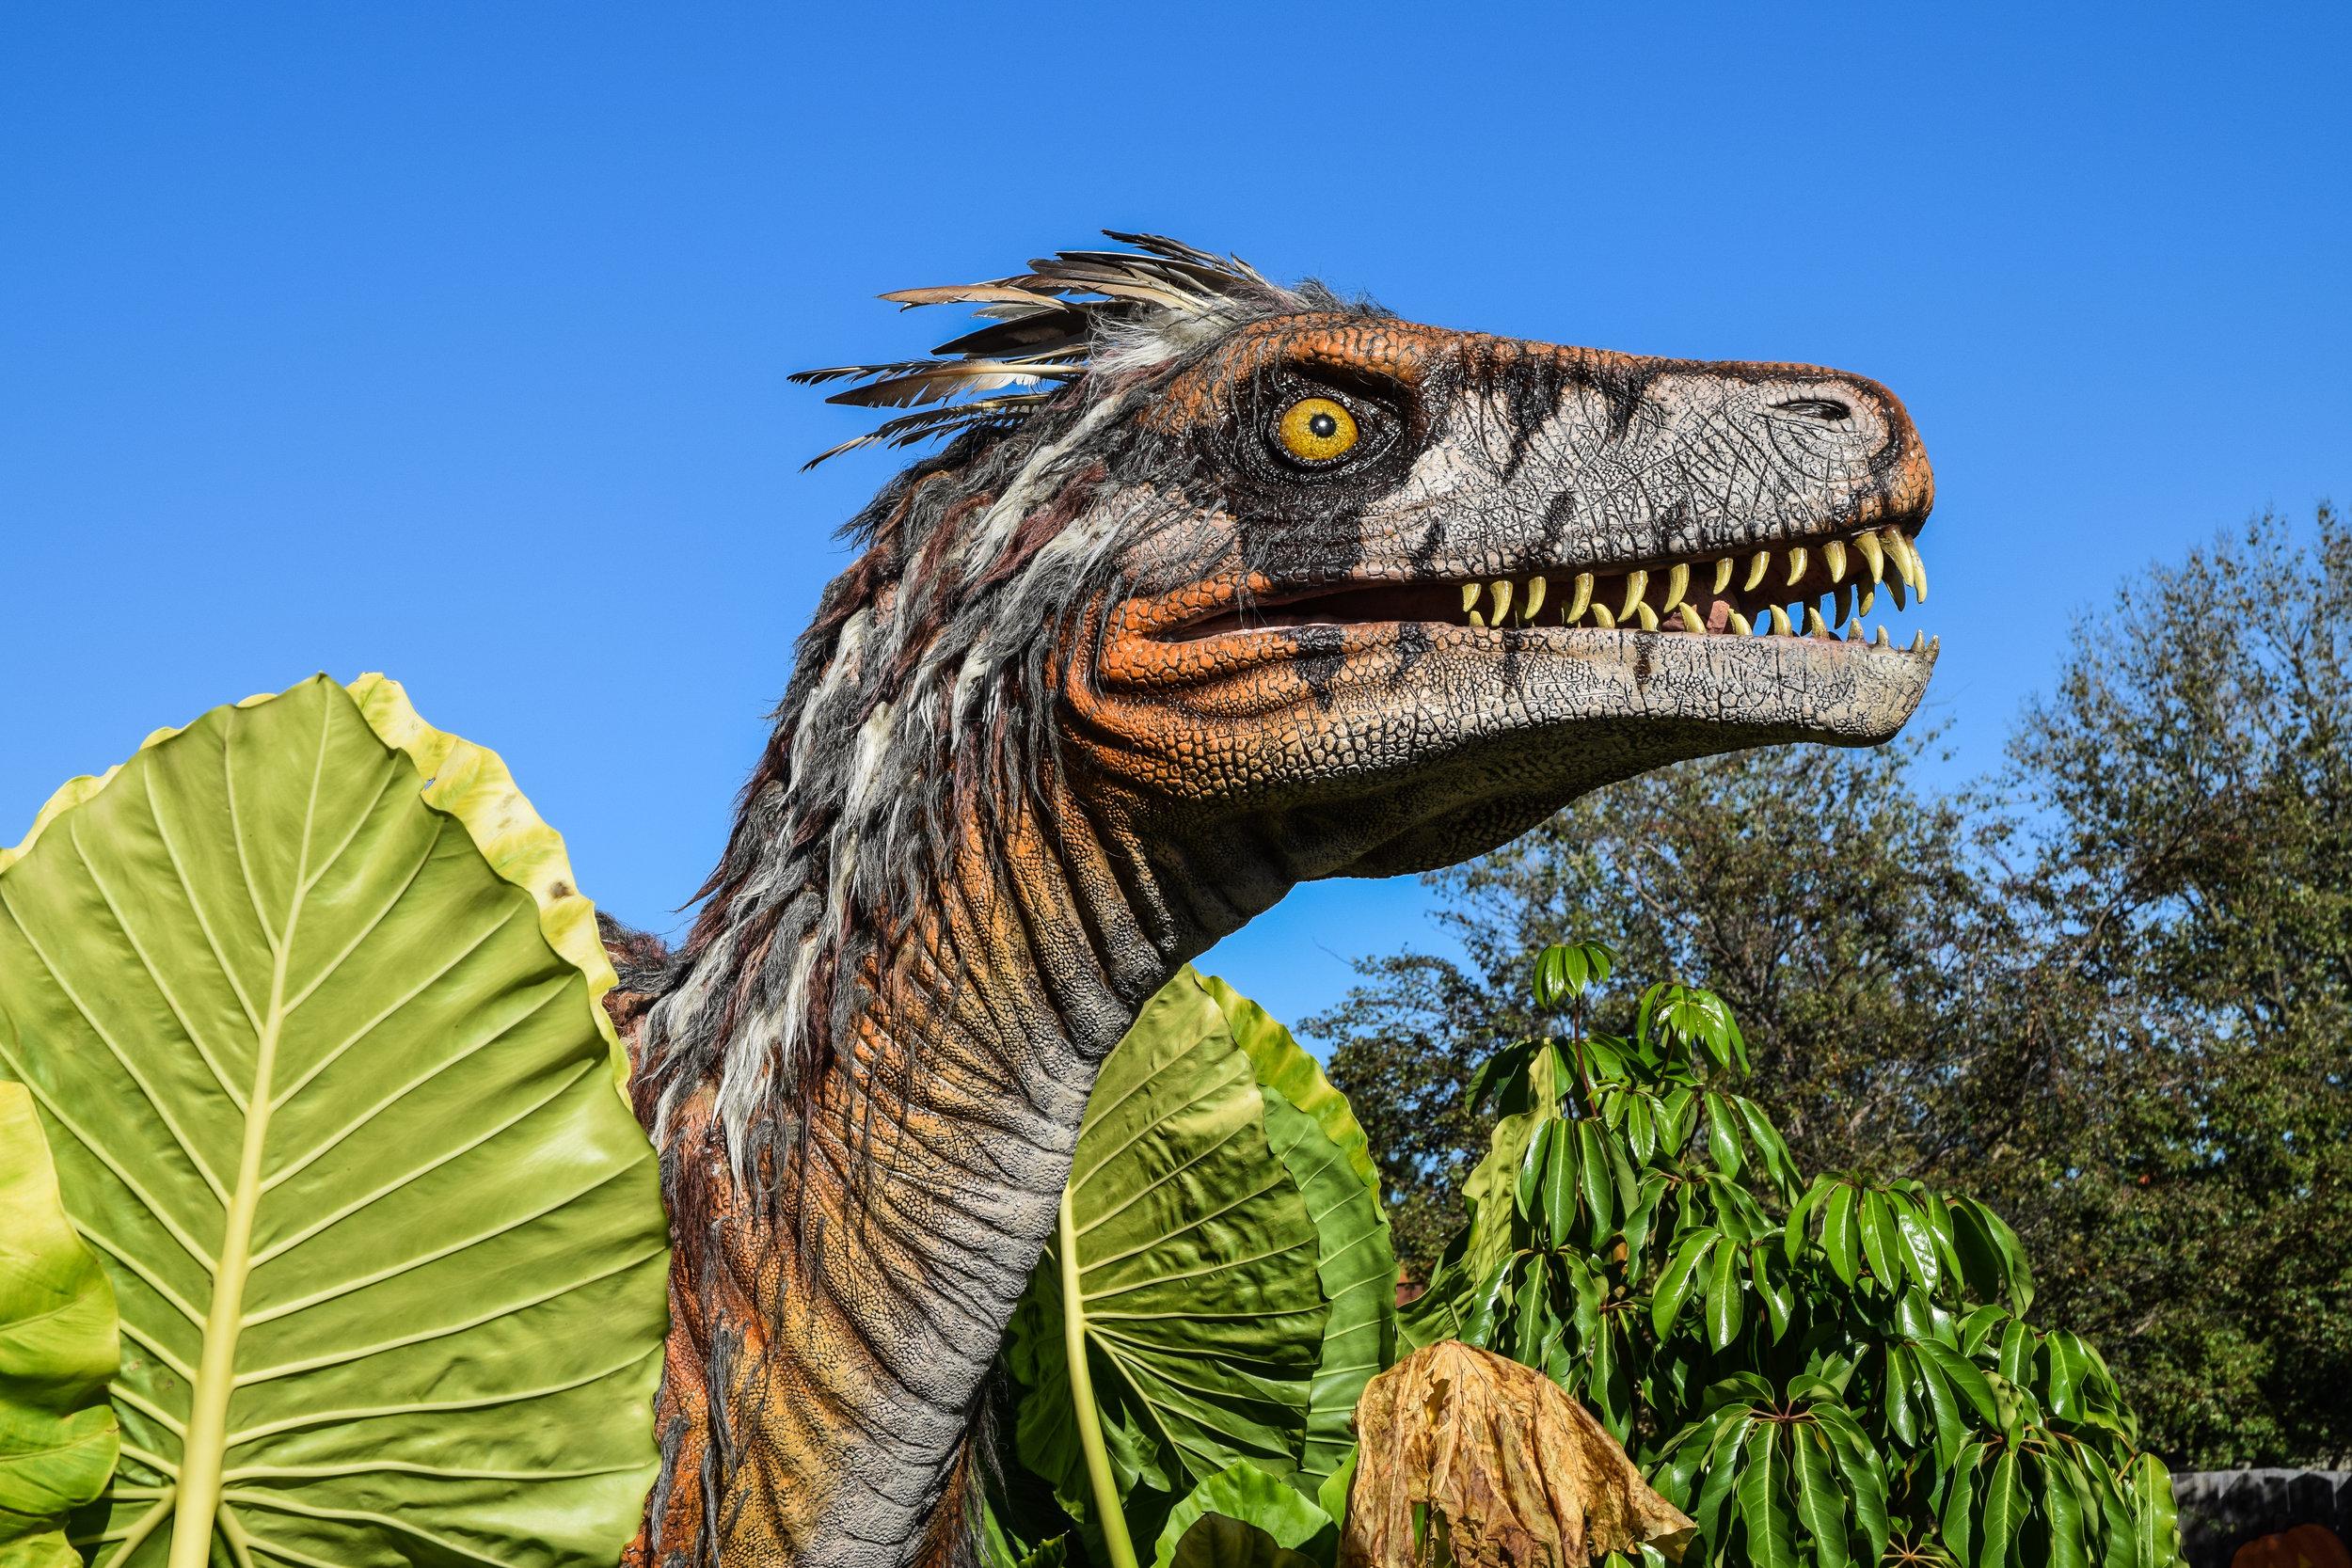 A dinosaur head poking through trees